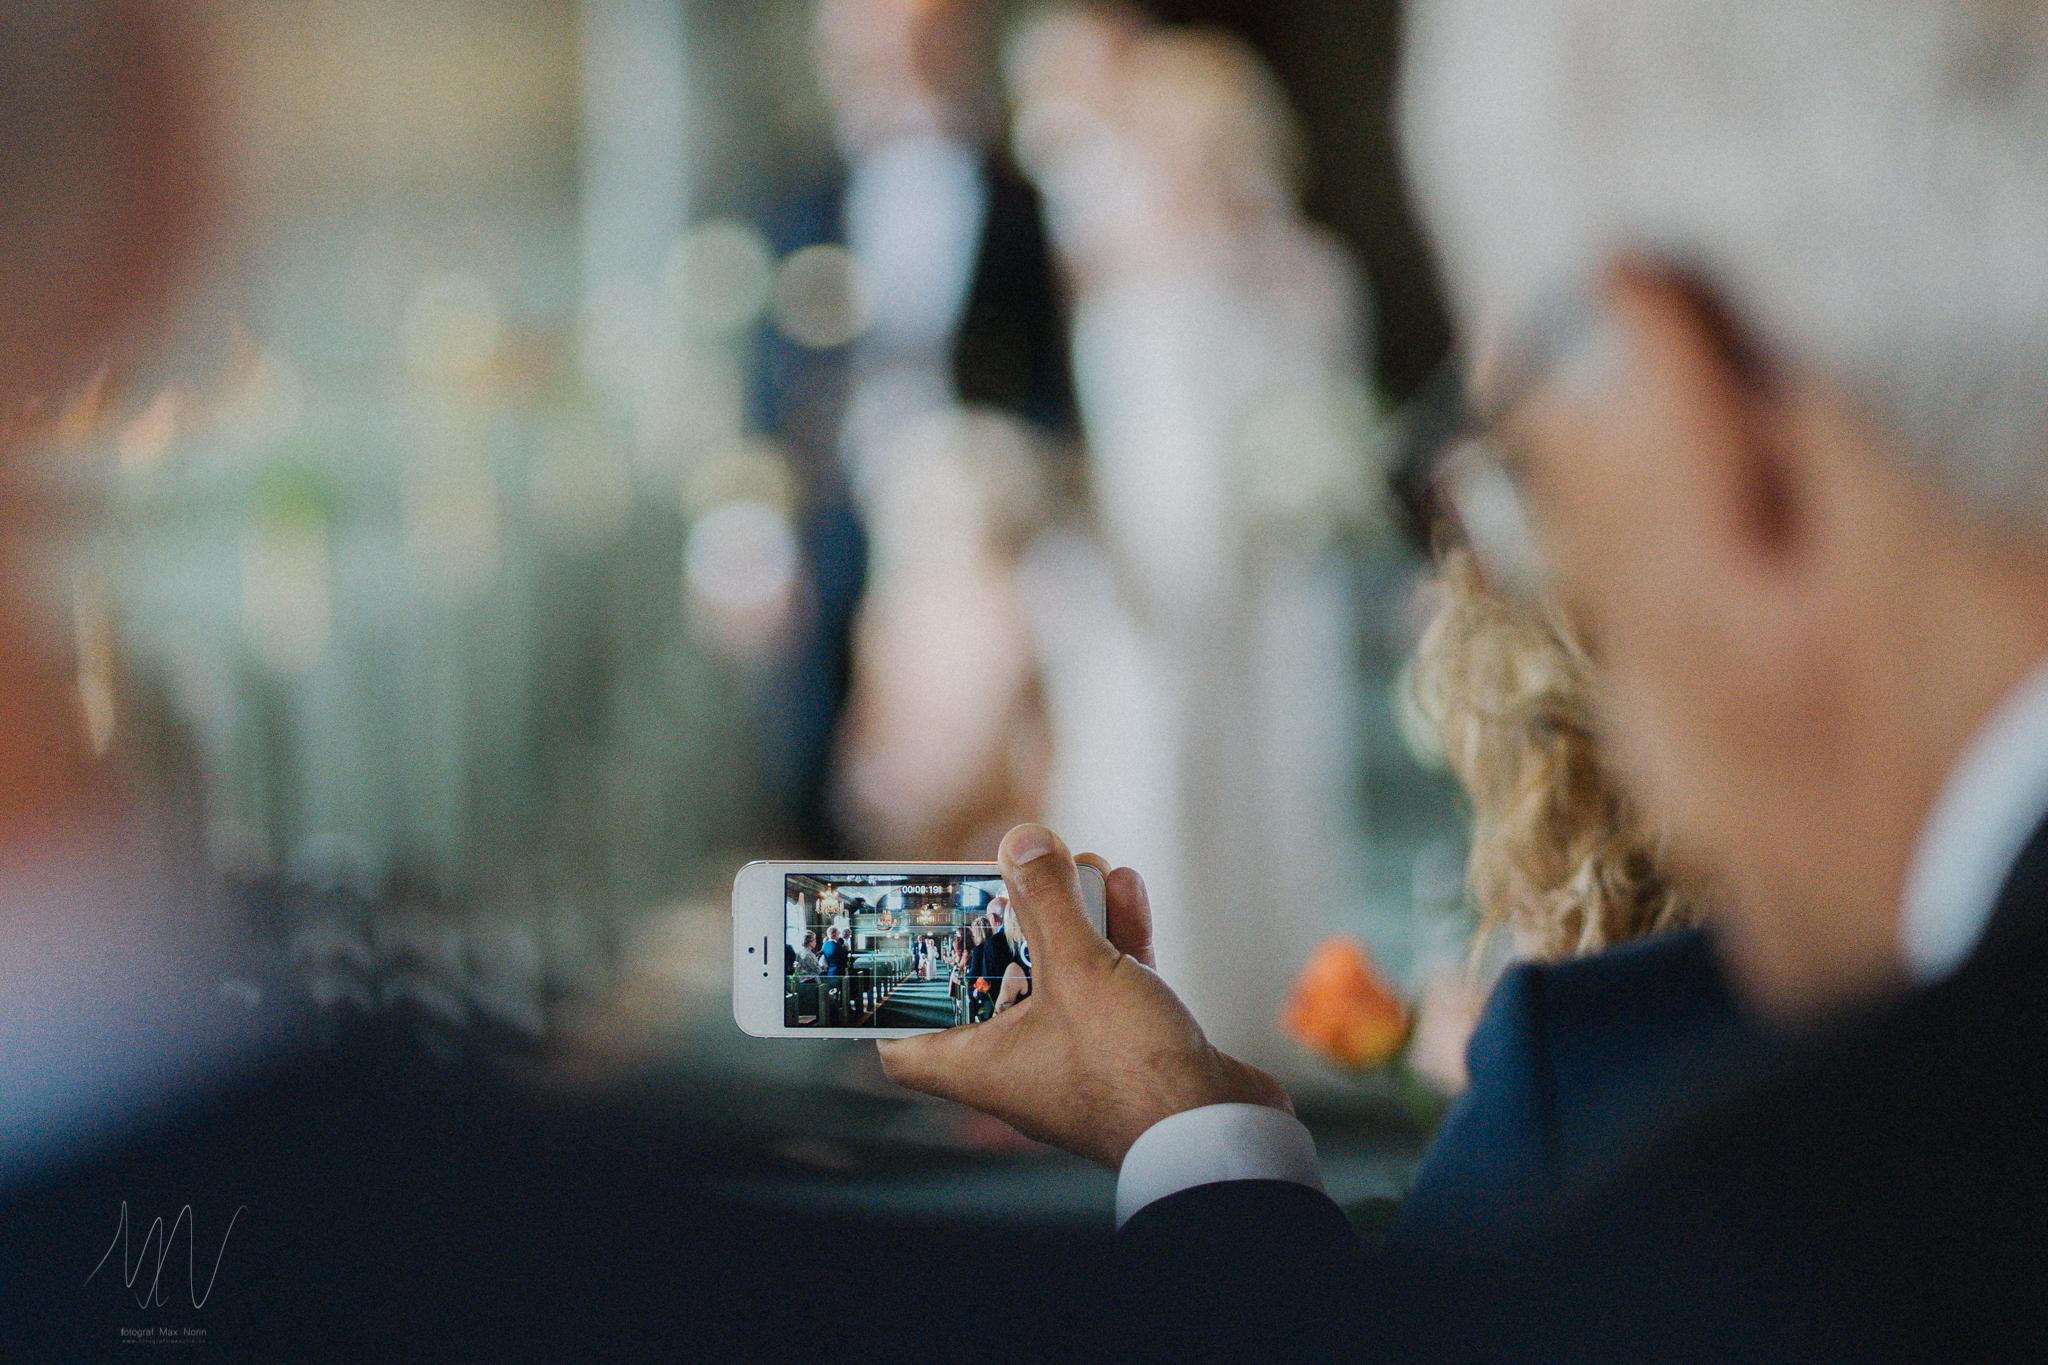 Bröllop-fotografmaxnorin.se-MariaMarcus-54.JPG